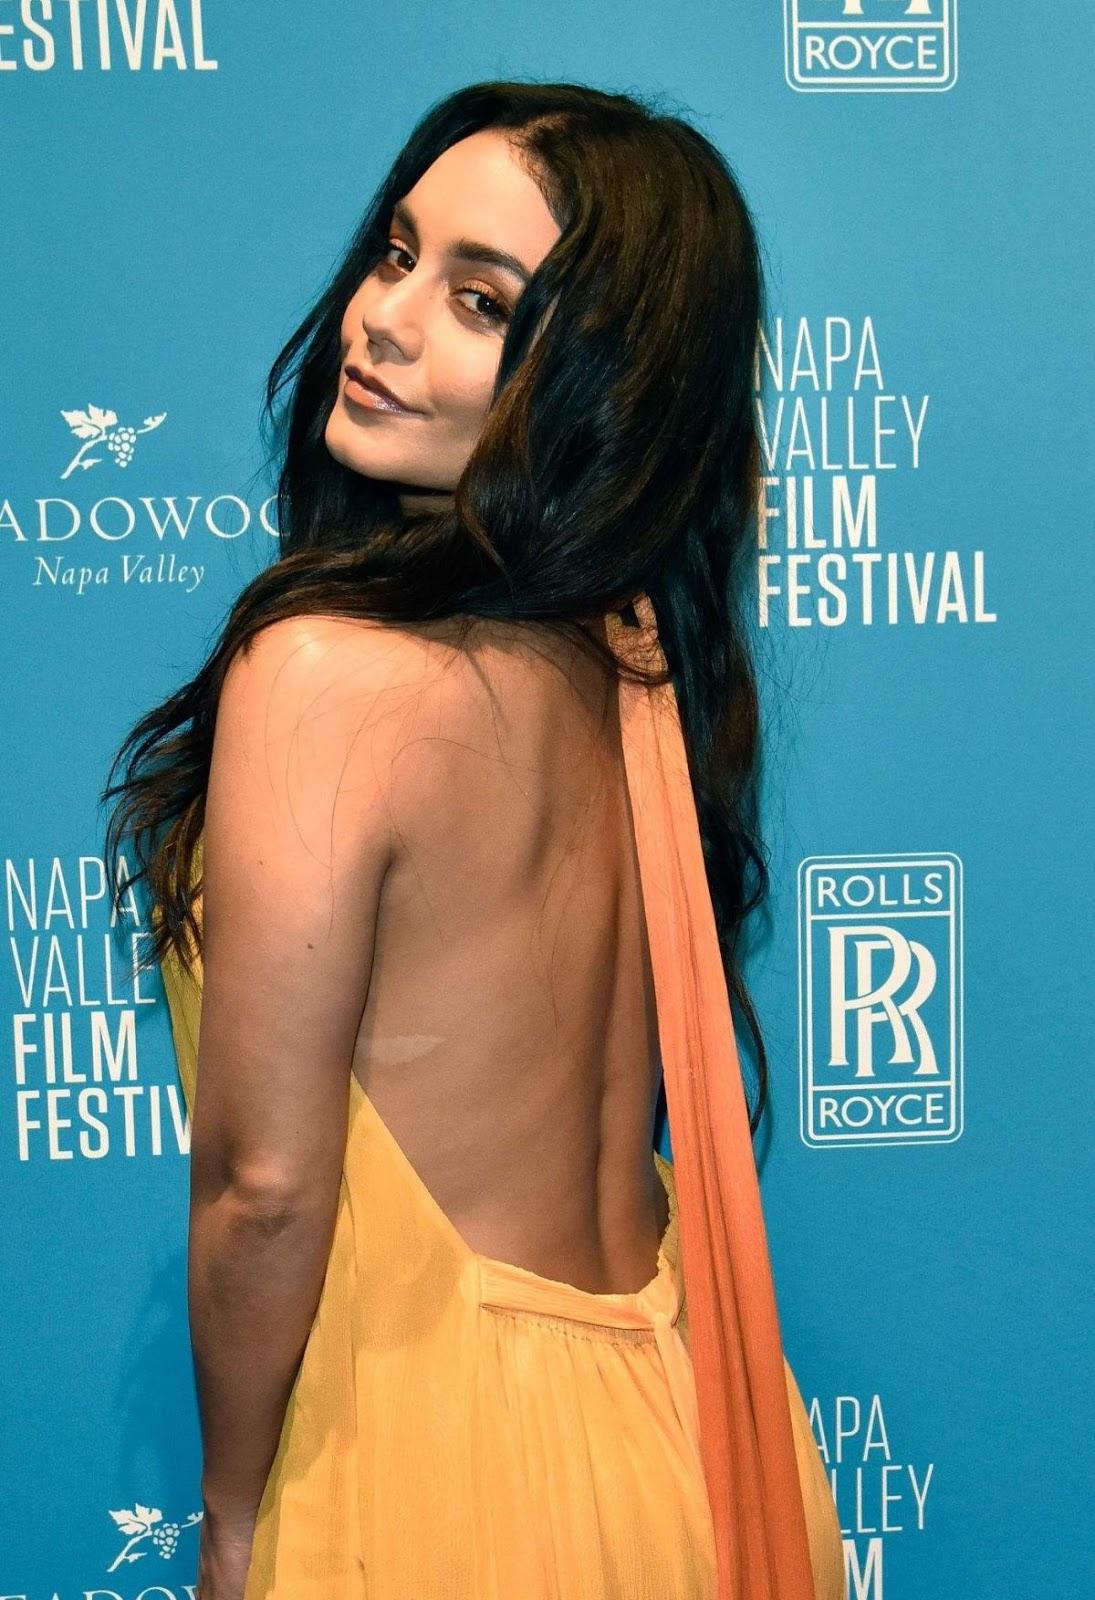 Vanessa Hudgens goes backless at the Napa Valley Film Festival